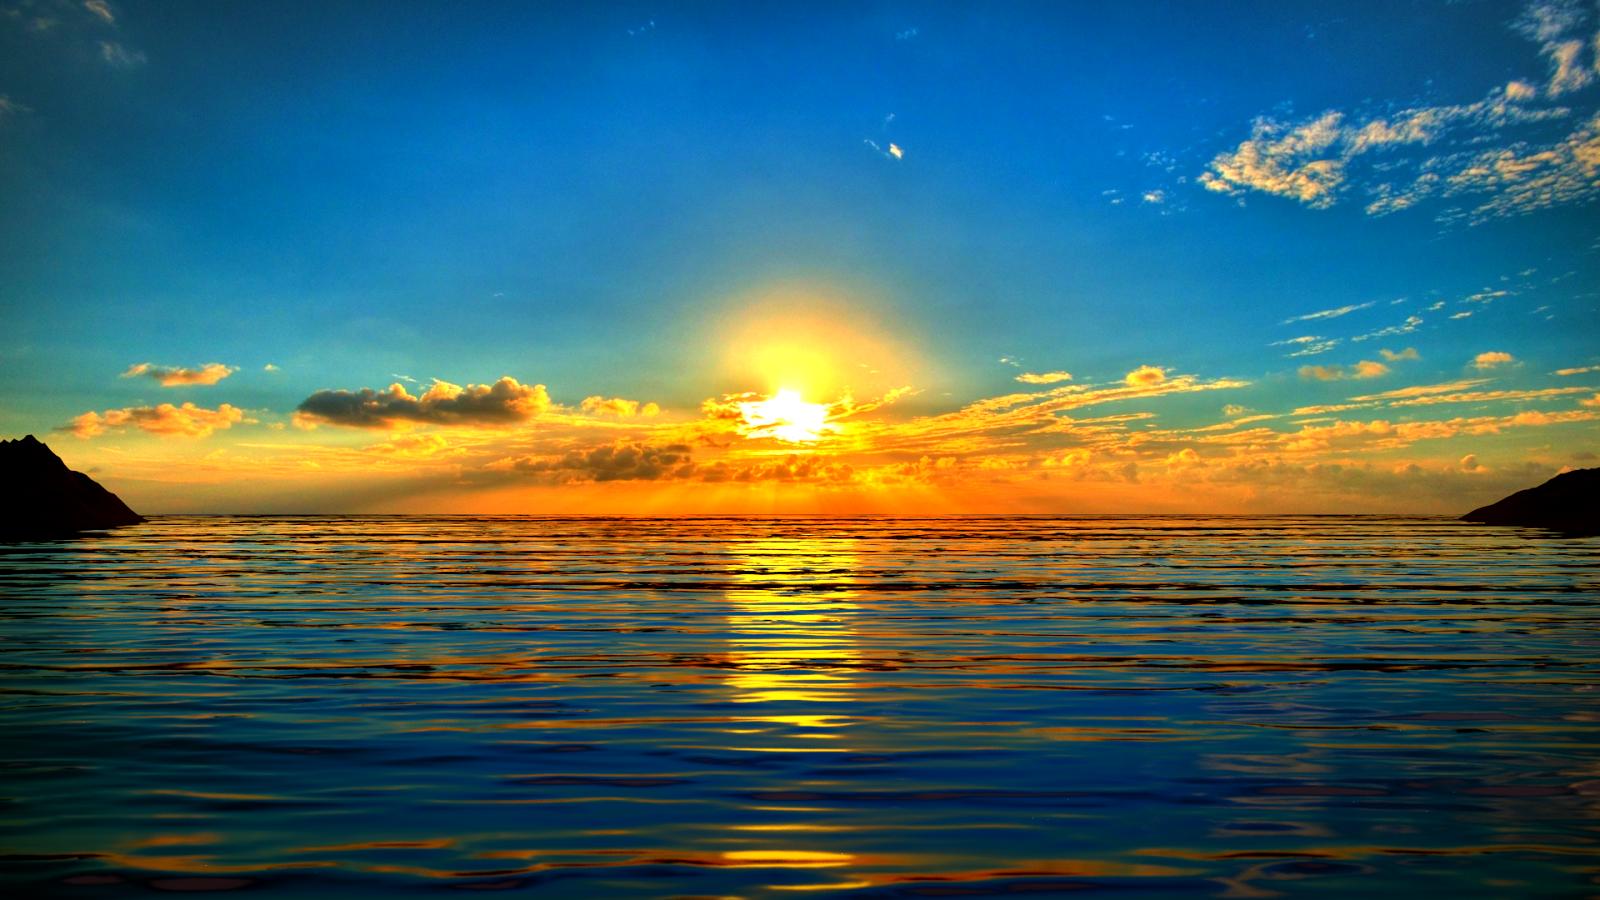 The Breathtaking View Of A Sunrise Is God S Good Morning Sunrise Landscape Sunrise Pictures Sunrise Wallpaper